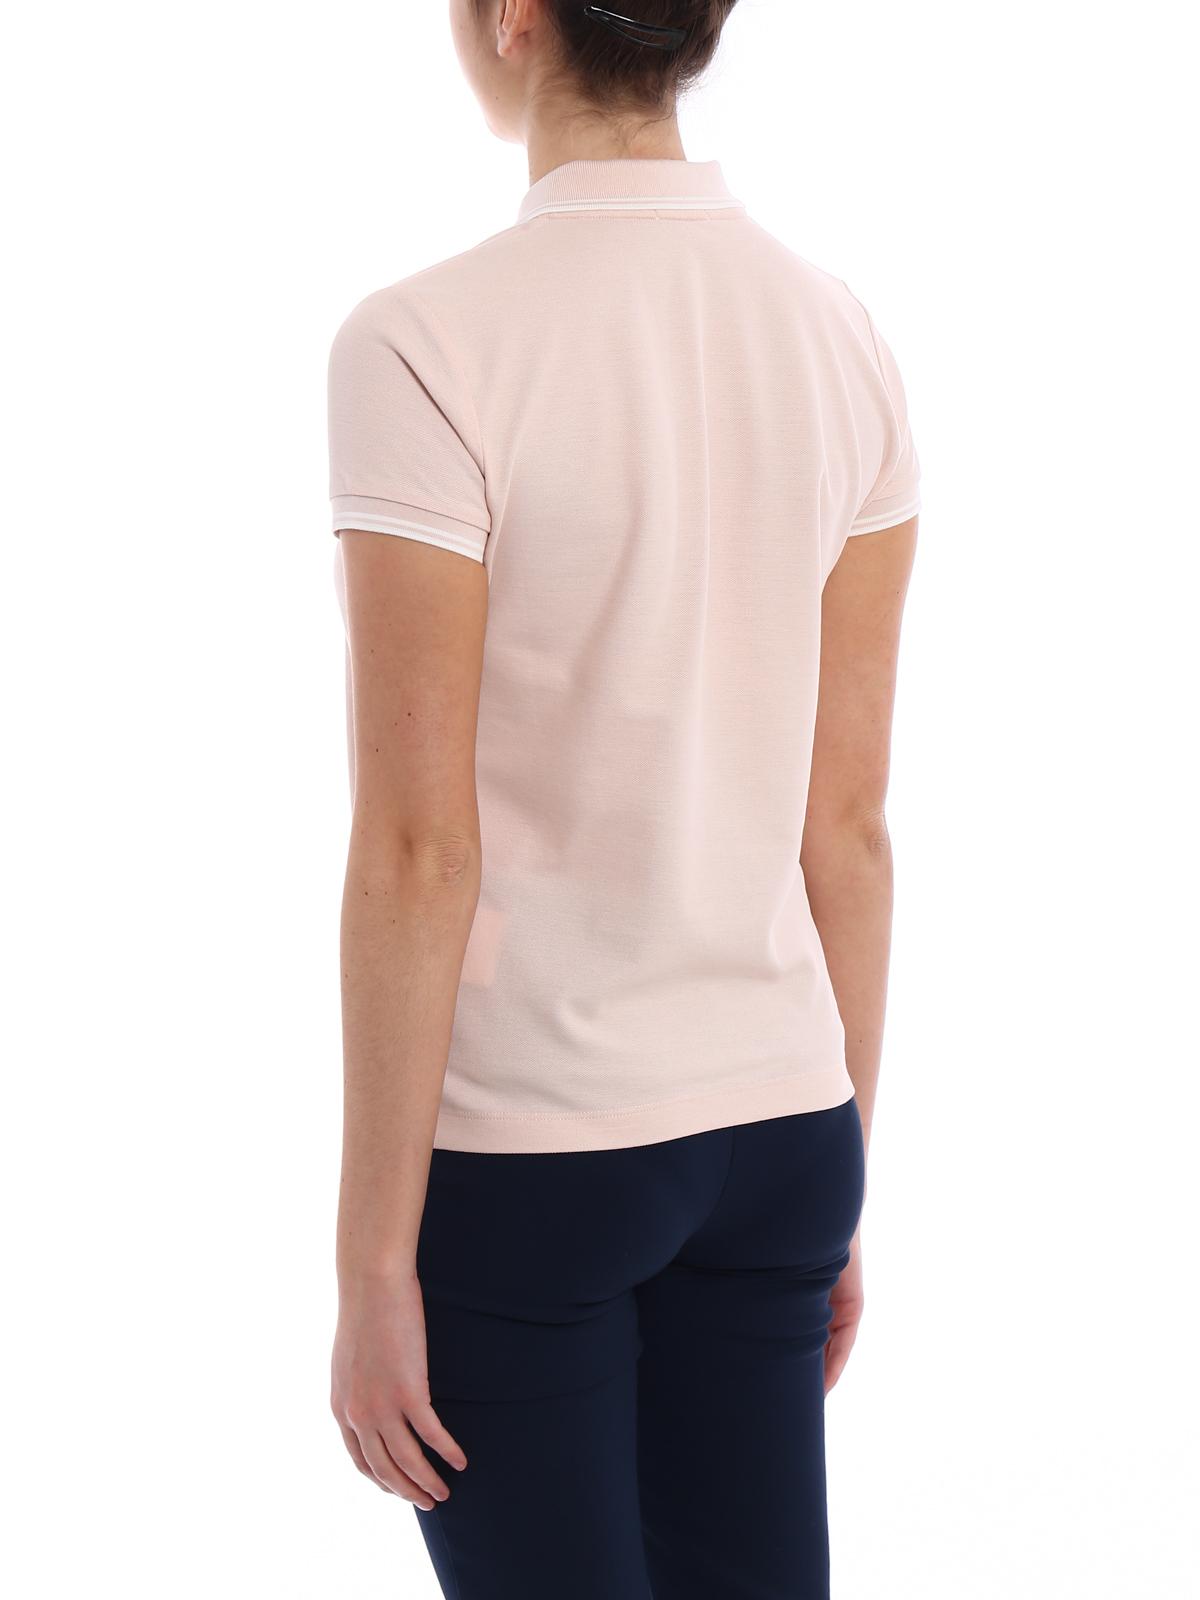 2bab6a28f26b Moncler - Light pink polo shirt - polo shirts - D1 093 8386000 84667 529